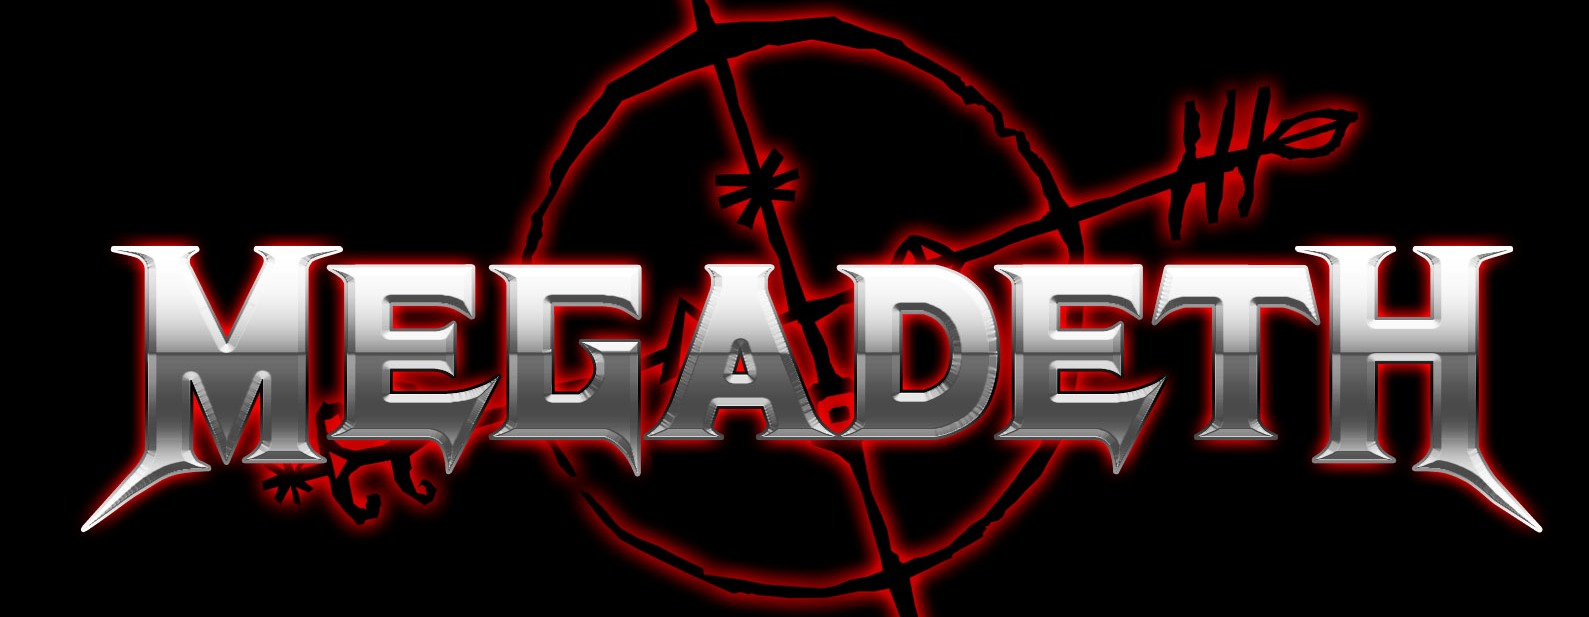 Image Gallery Megadeth Logo